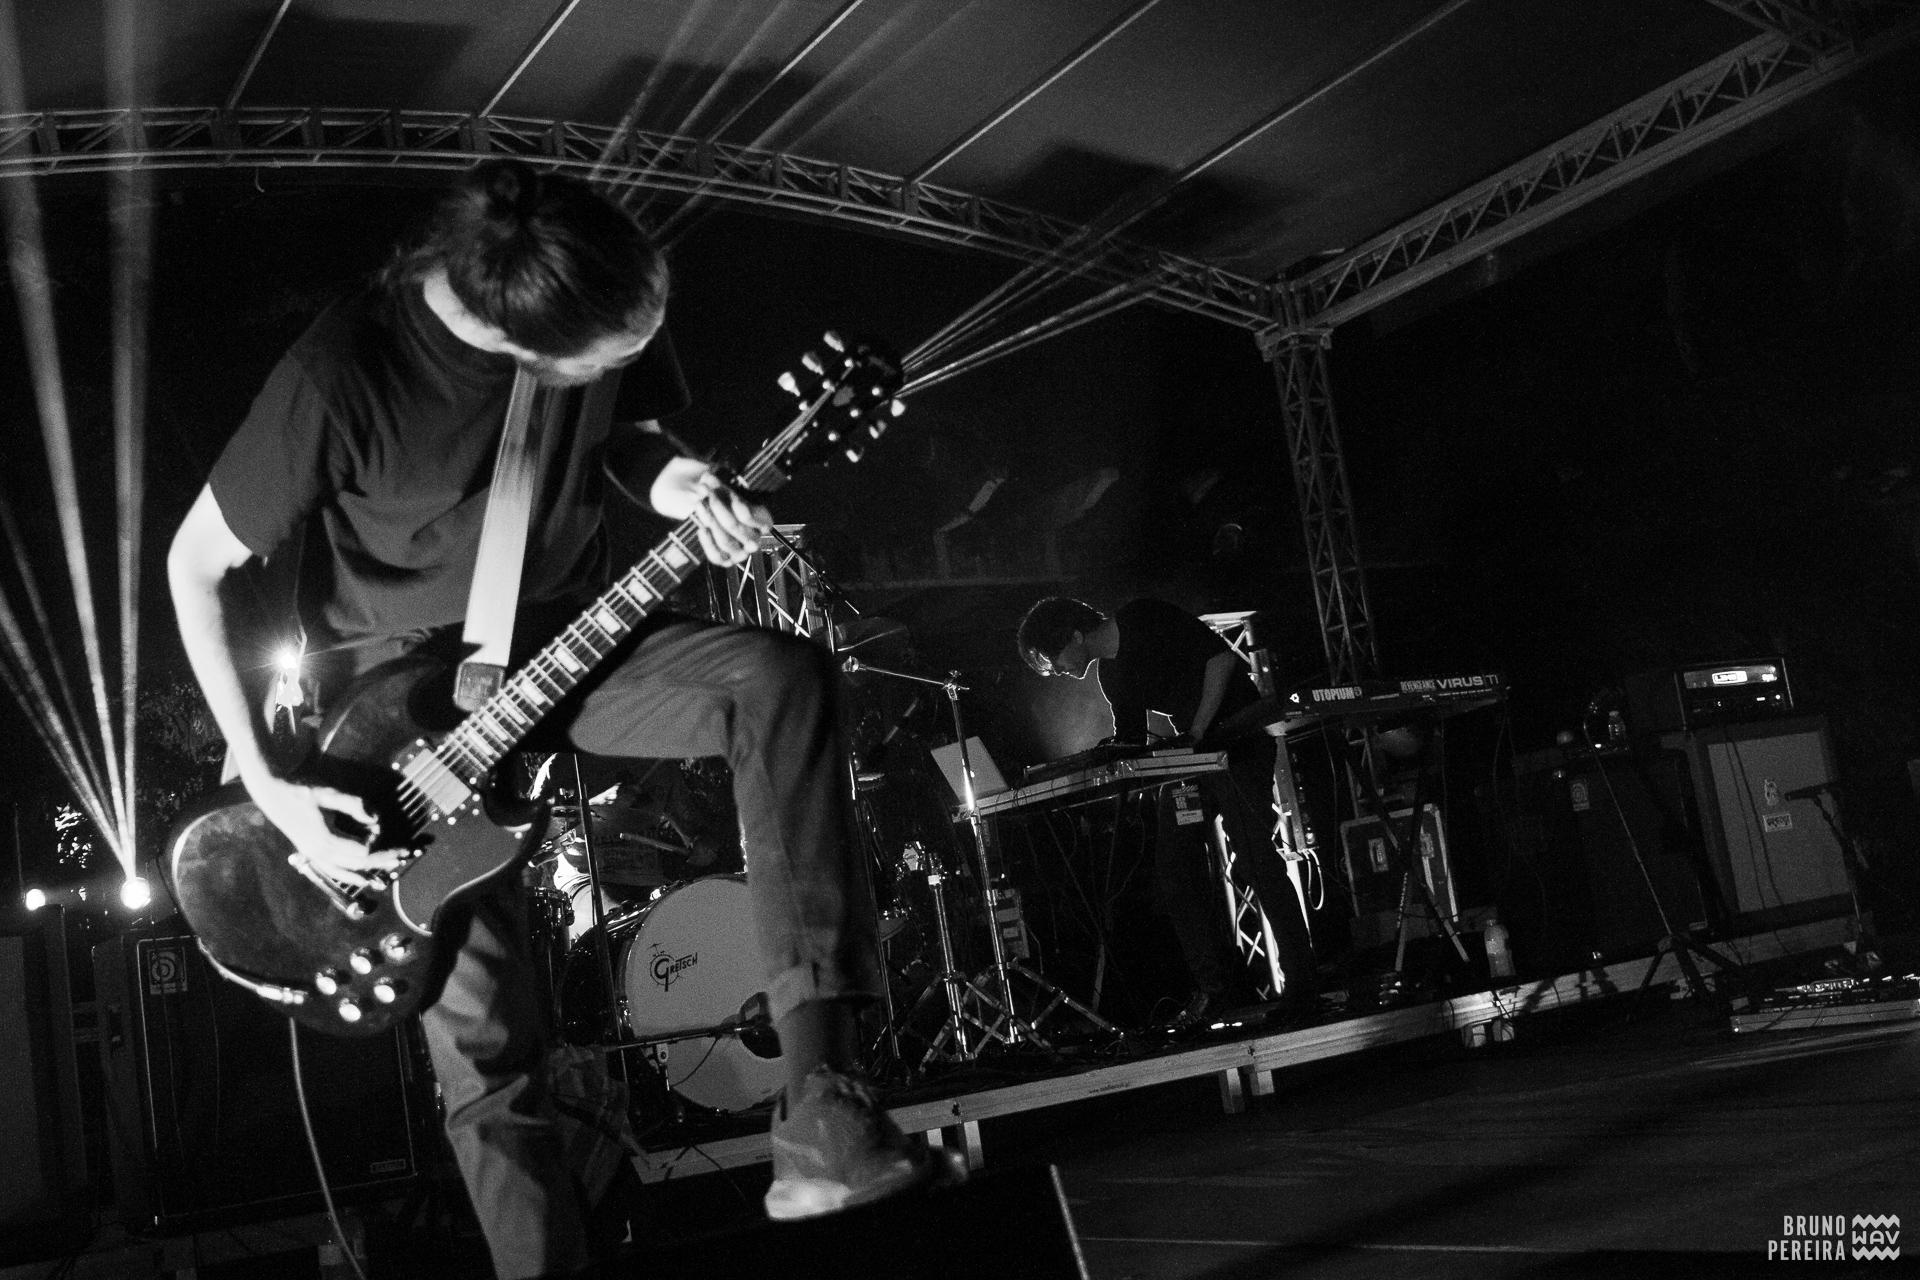 LÖBO - Serralves em Festa, Porto [4Jun2016] Foto-reportagem